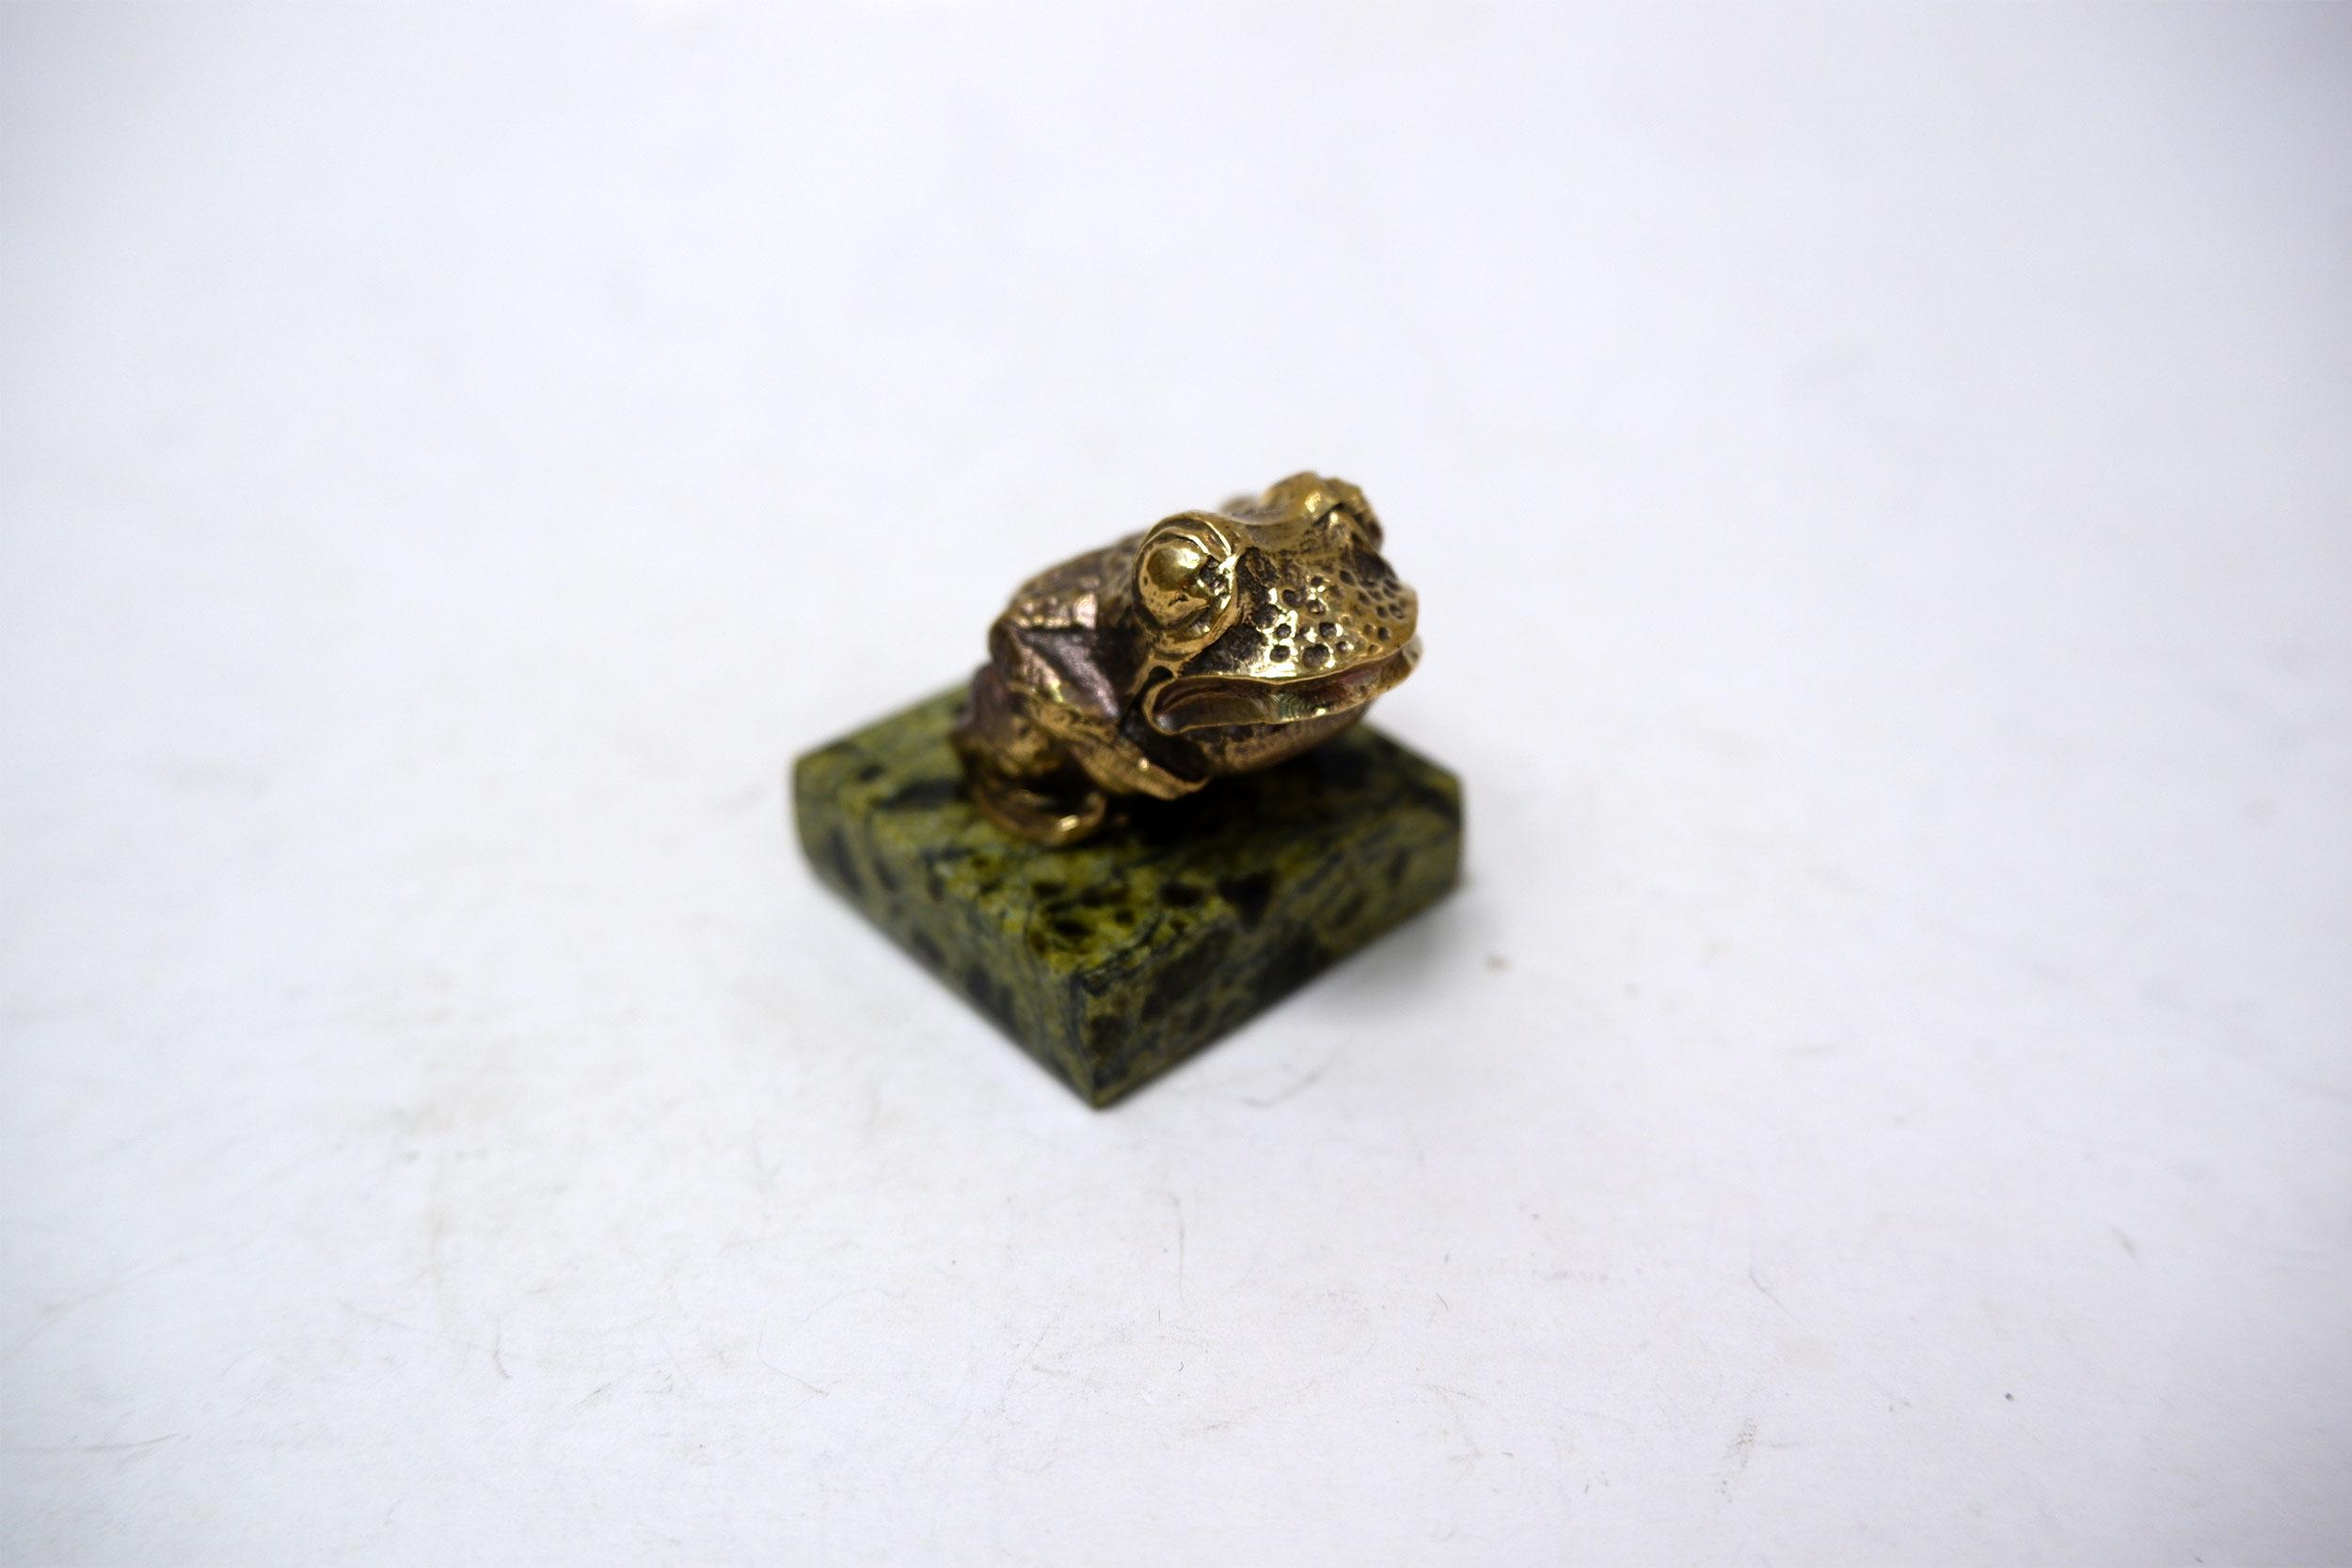 Лягушка из бронзы на змеевике